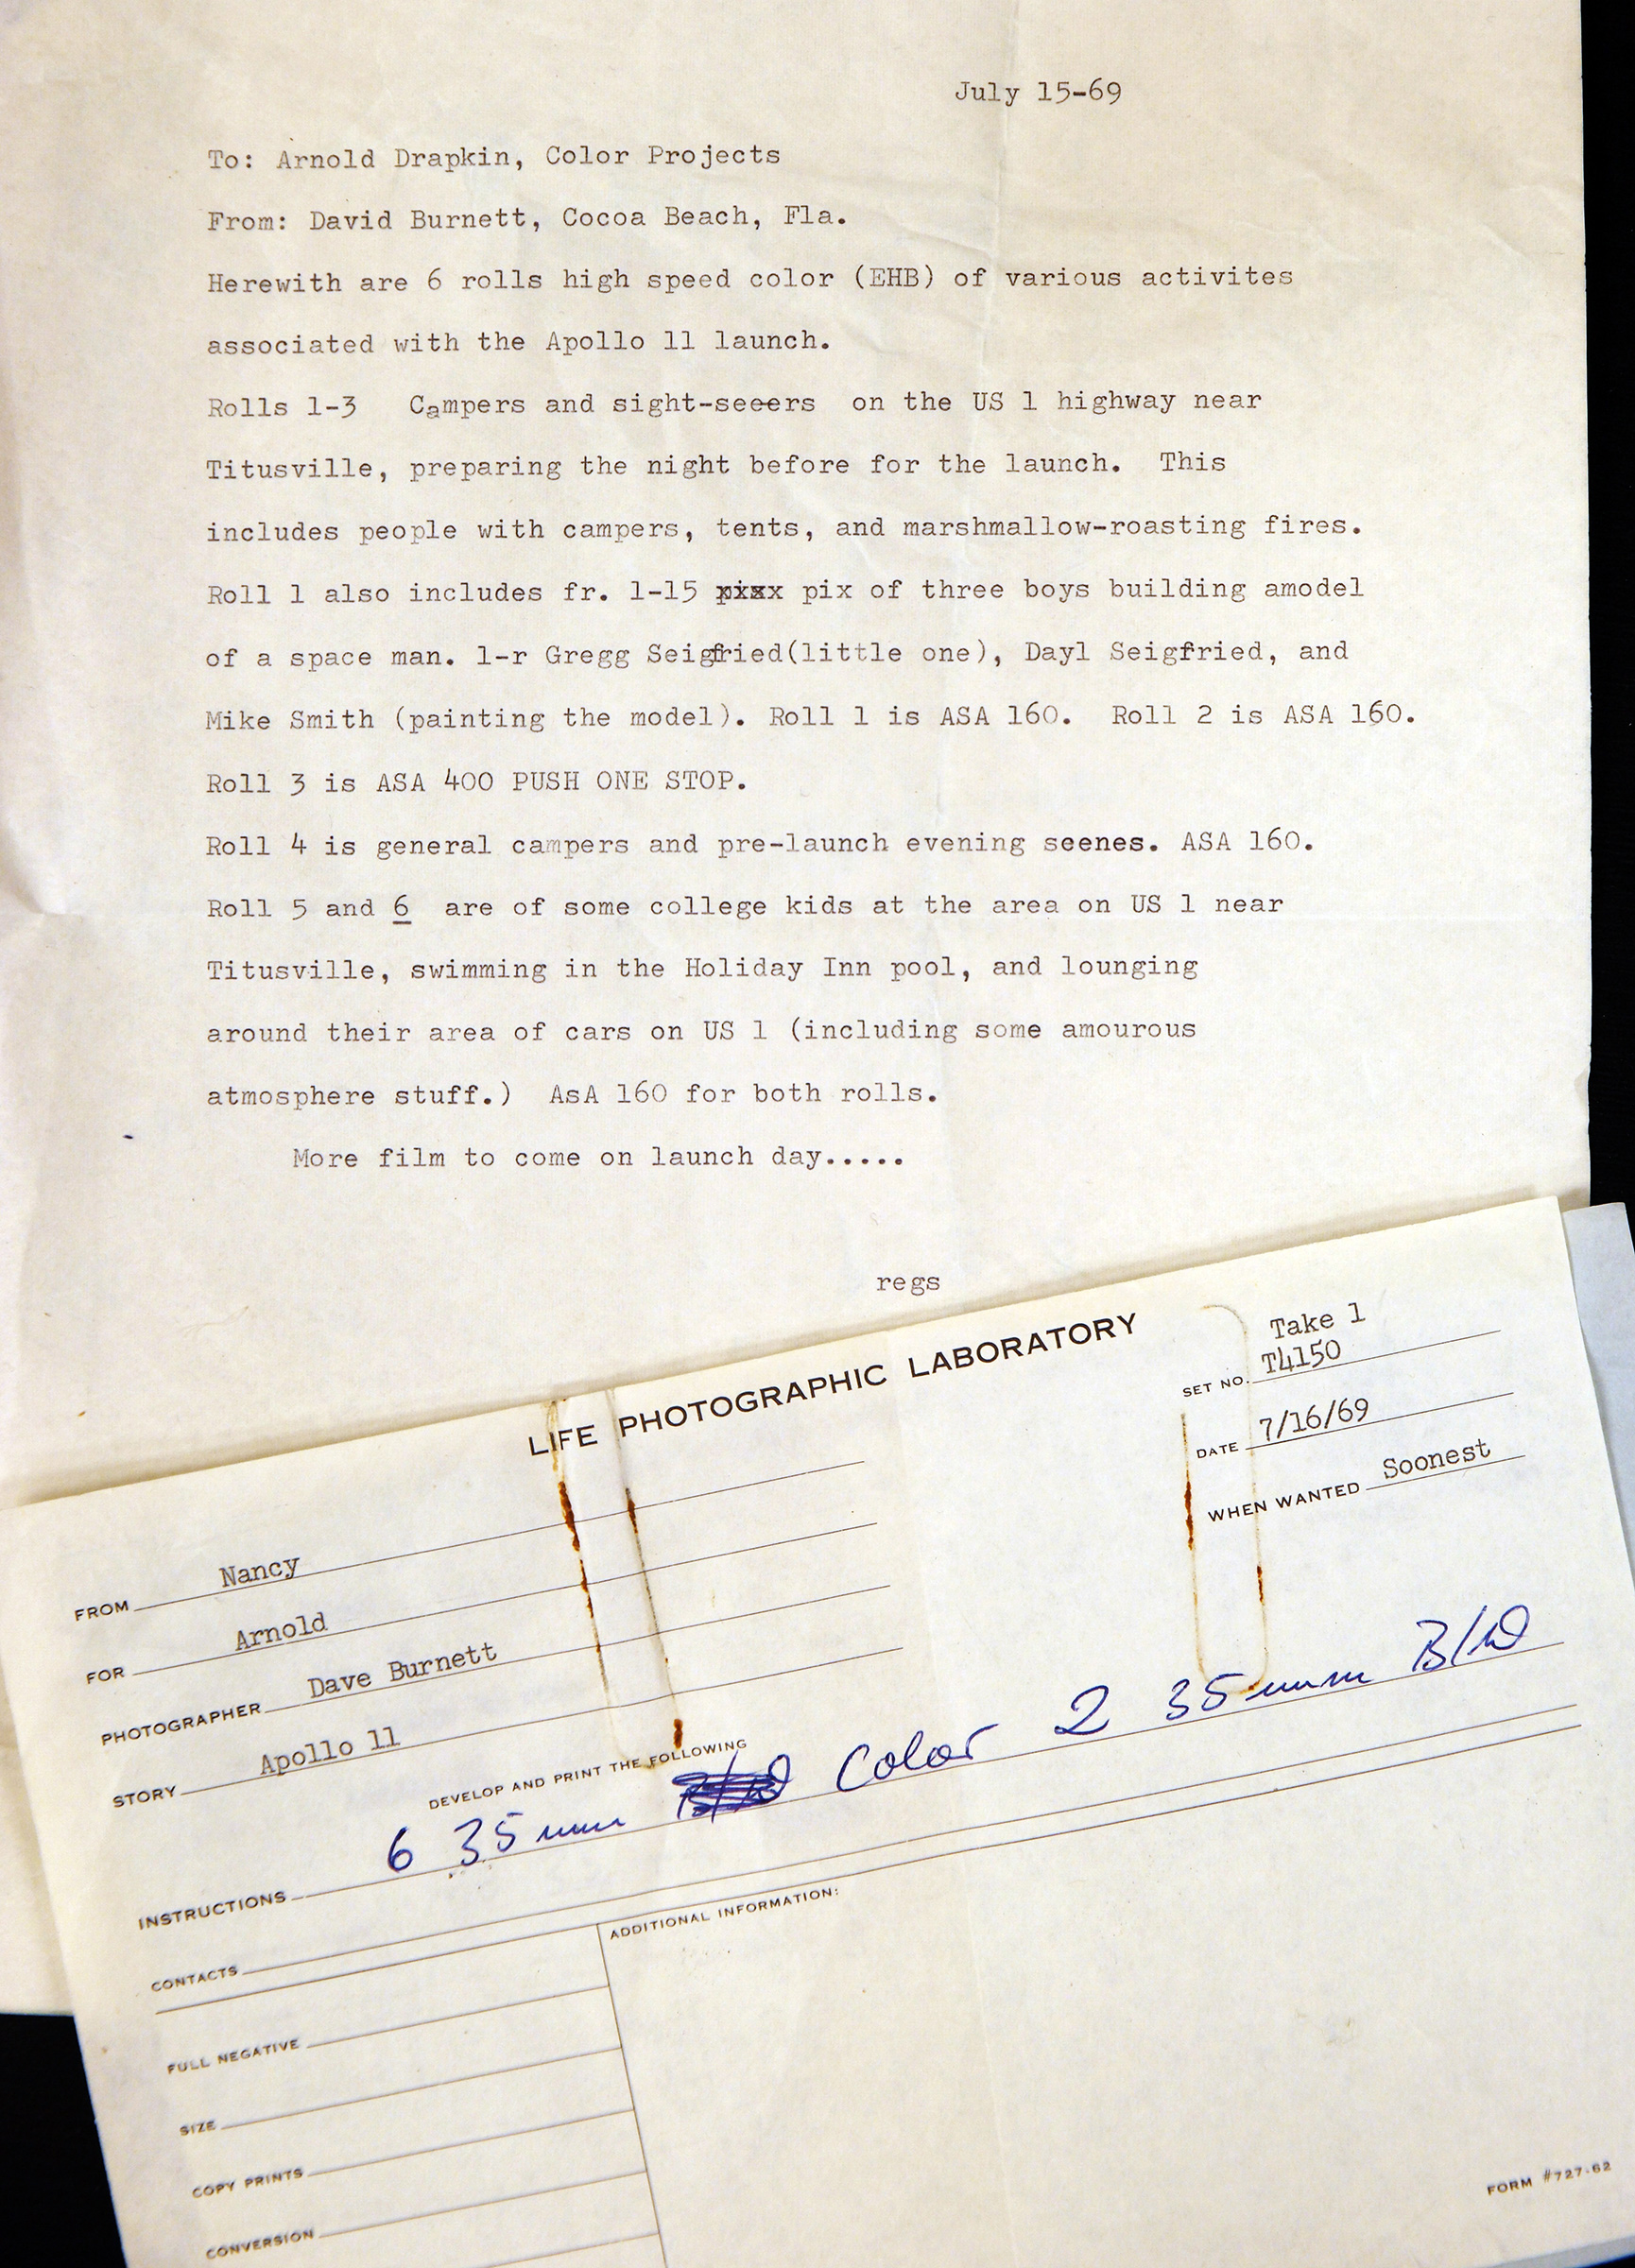 David Burnett's original captions sent to the LIFE photo lab on July 15, 1969.